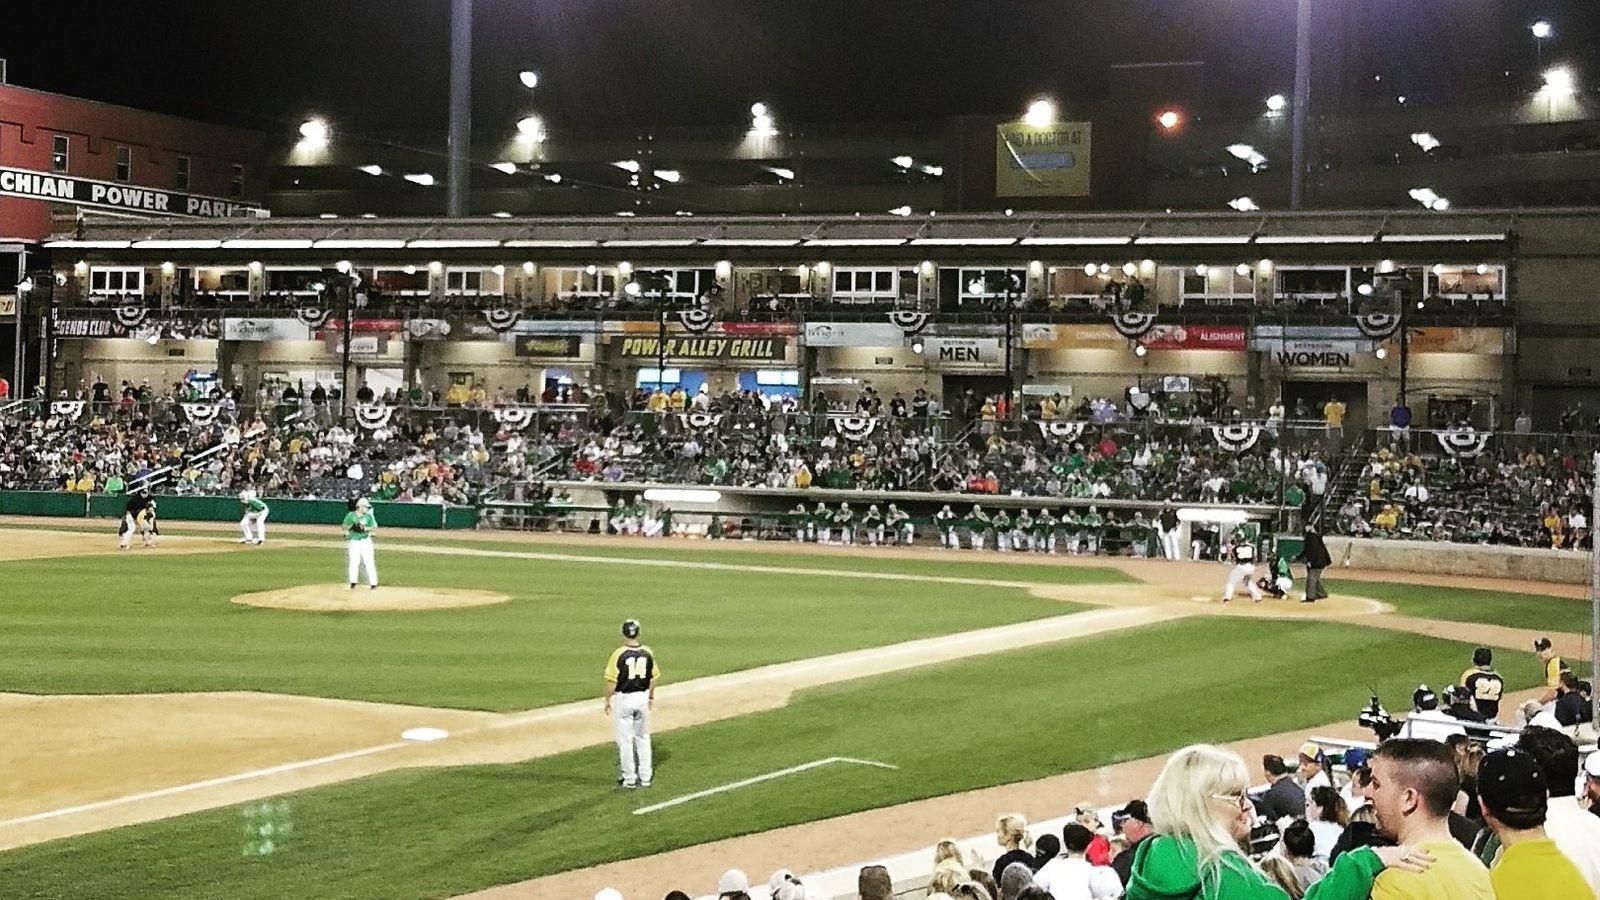 Wvu_baseball.0